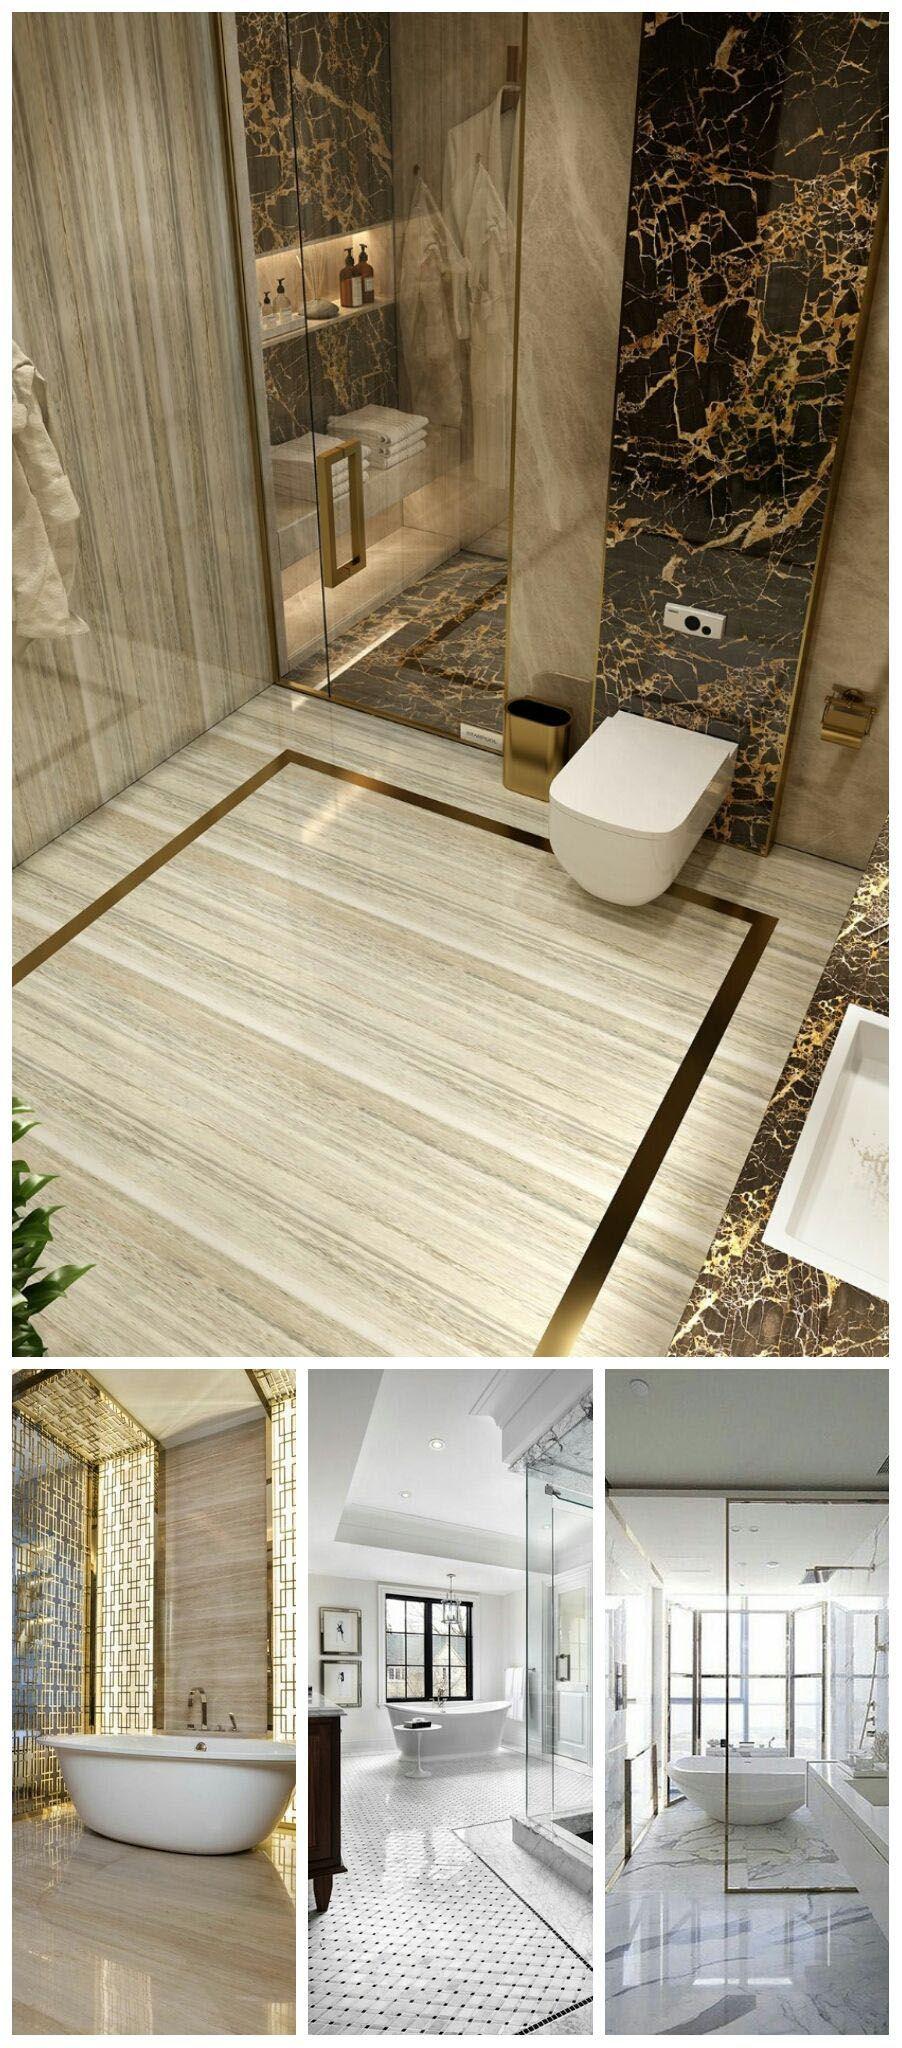 Lovely Bathroom Remodel Design Tool Free Made Easy Sleek Bathroom Bathroom Remodel Designs Bathroom Design Tool